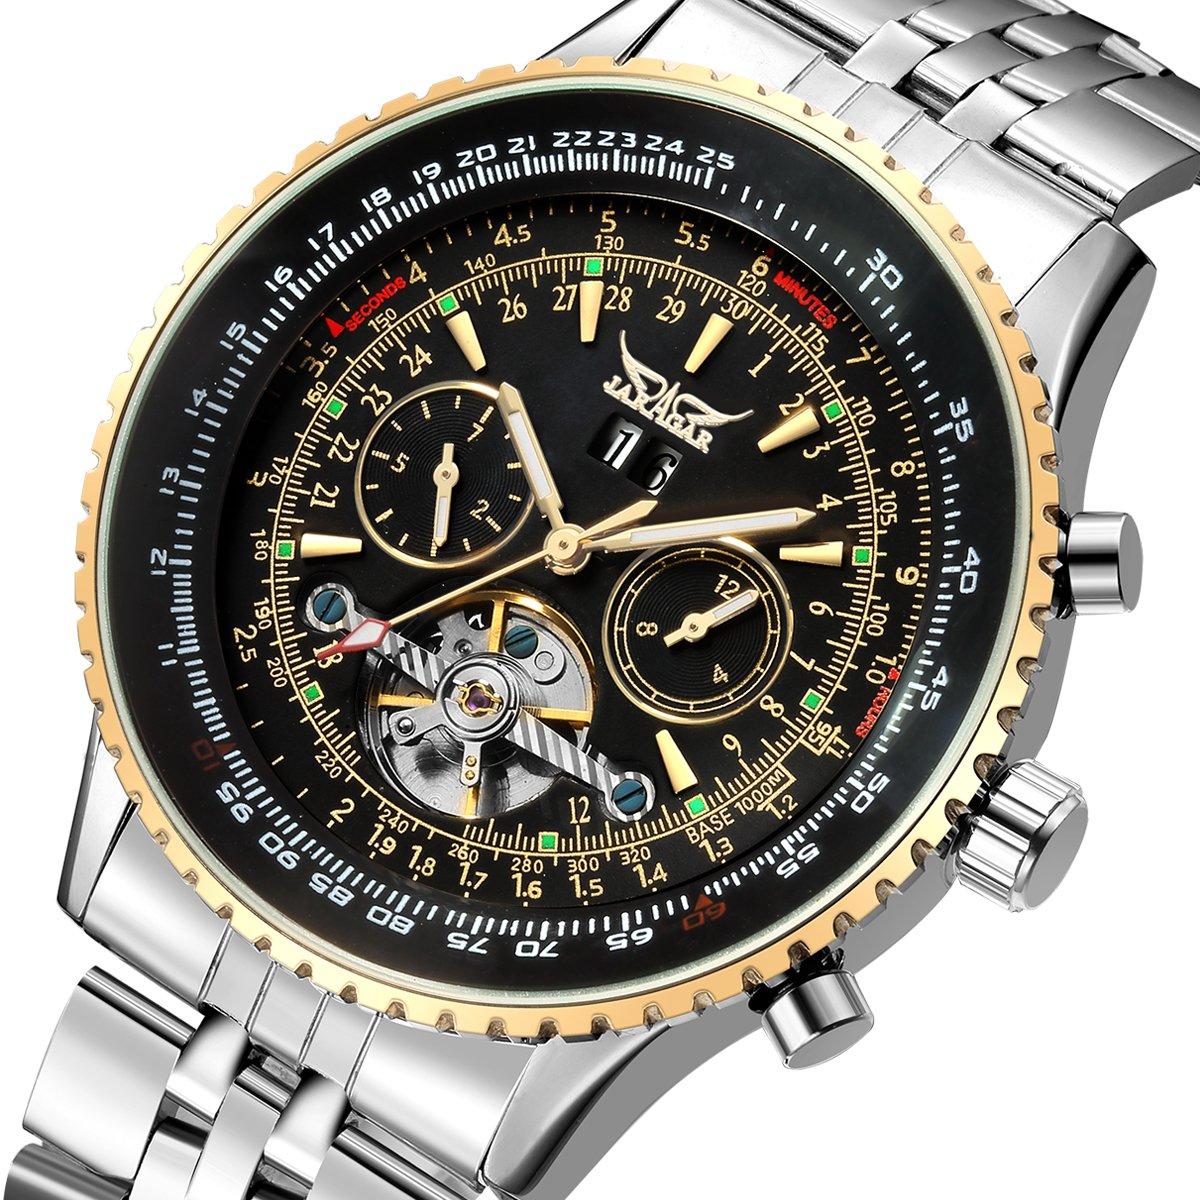 Amazon.com: GuTe Pro Mens Tourbillon Mechanical Watch Tachymeter Day Date Month Wristwatch (Black): Watches